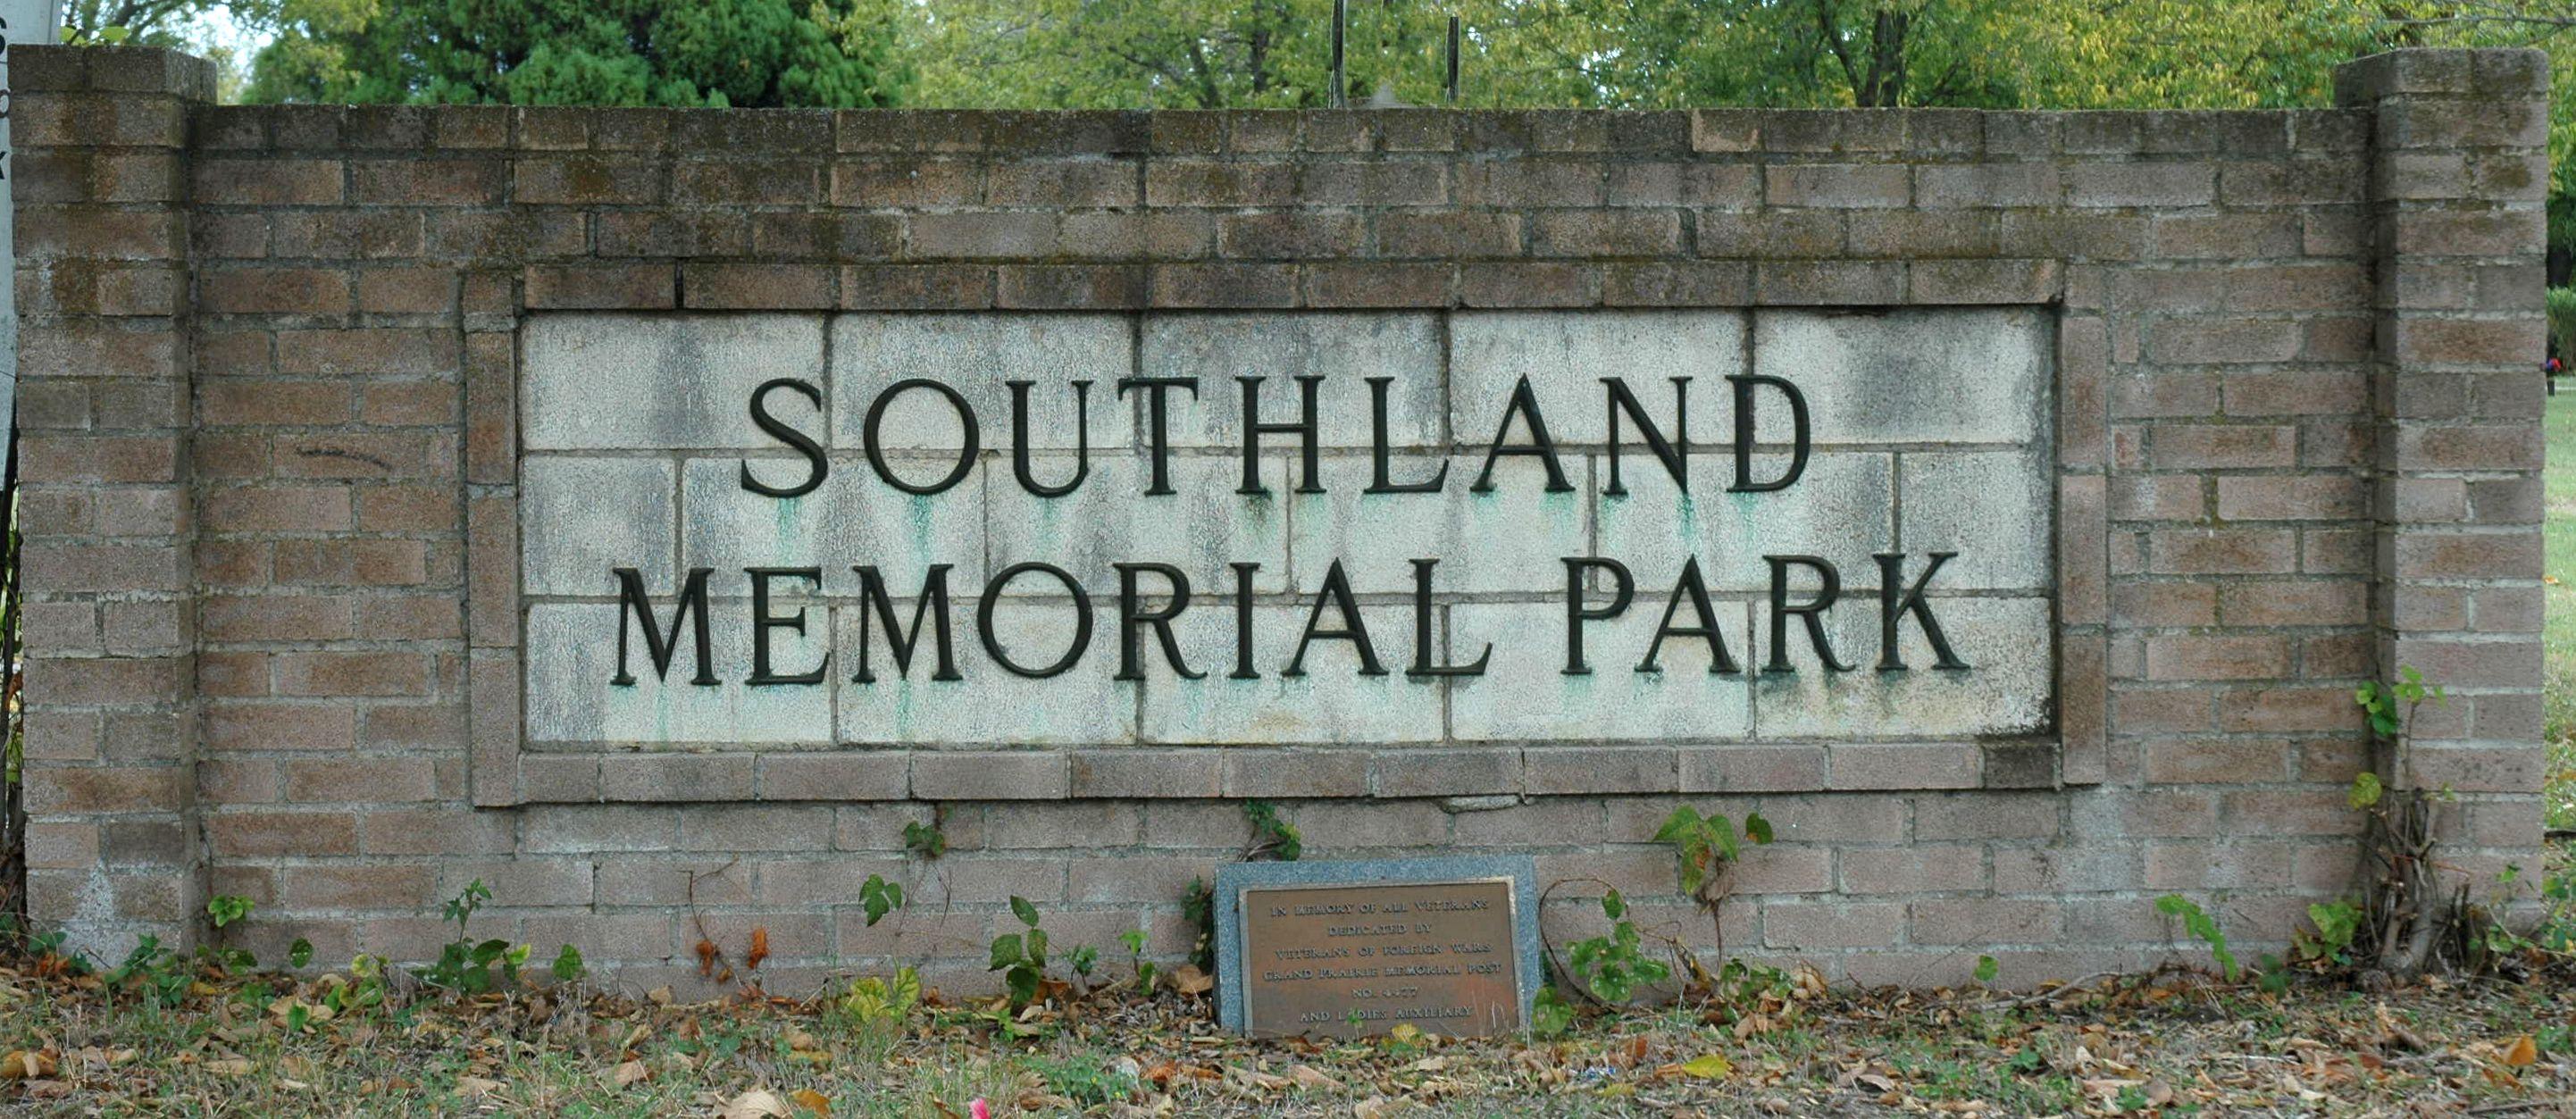 Southland Memorial Park